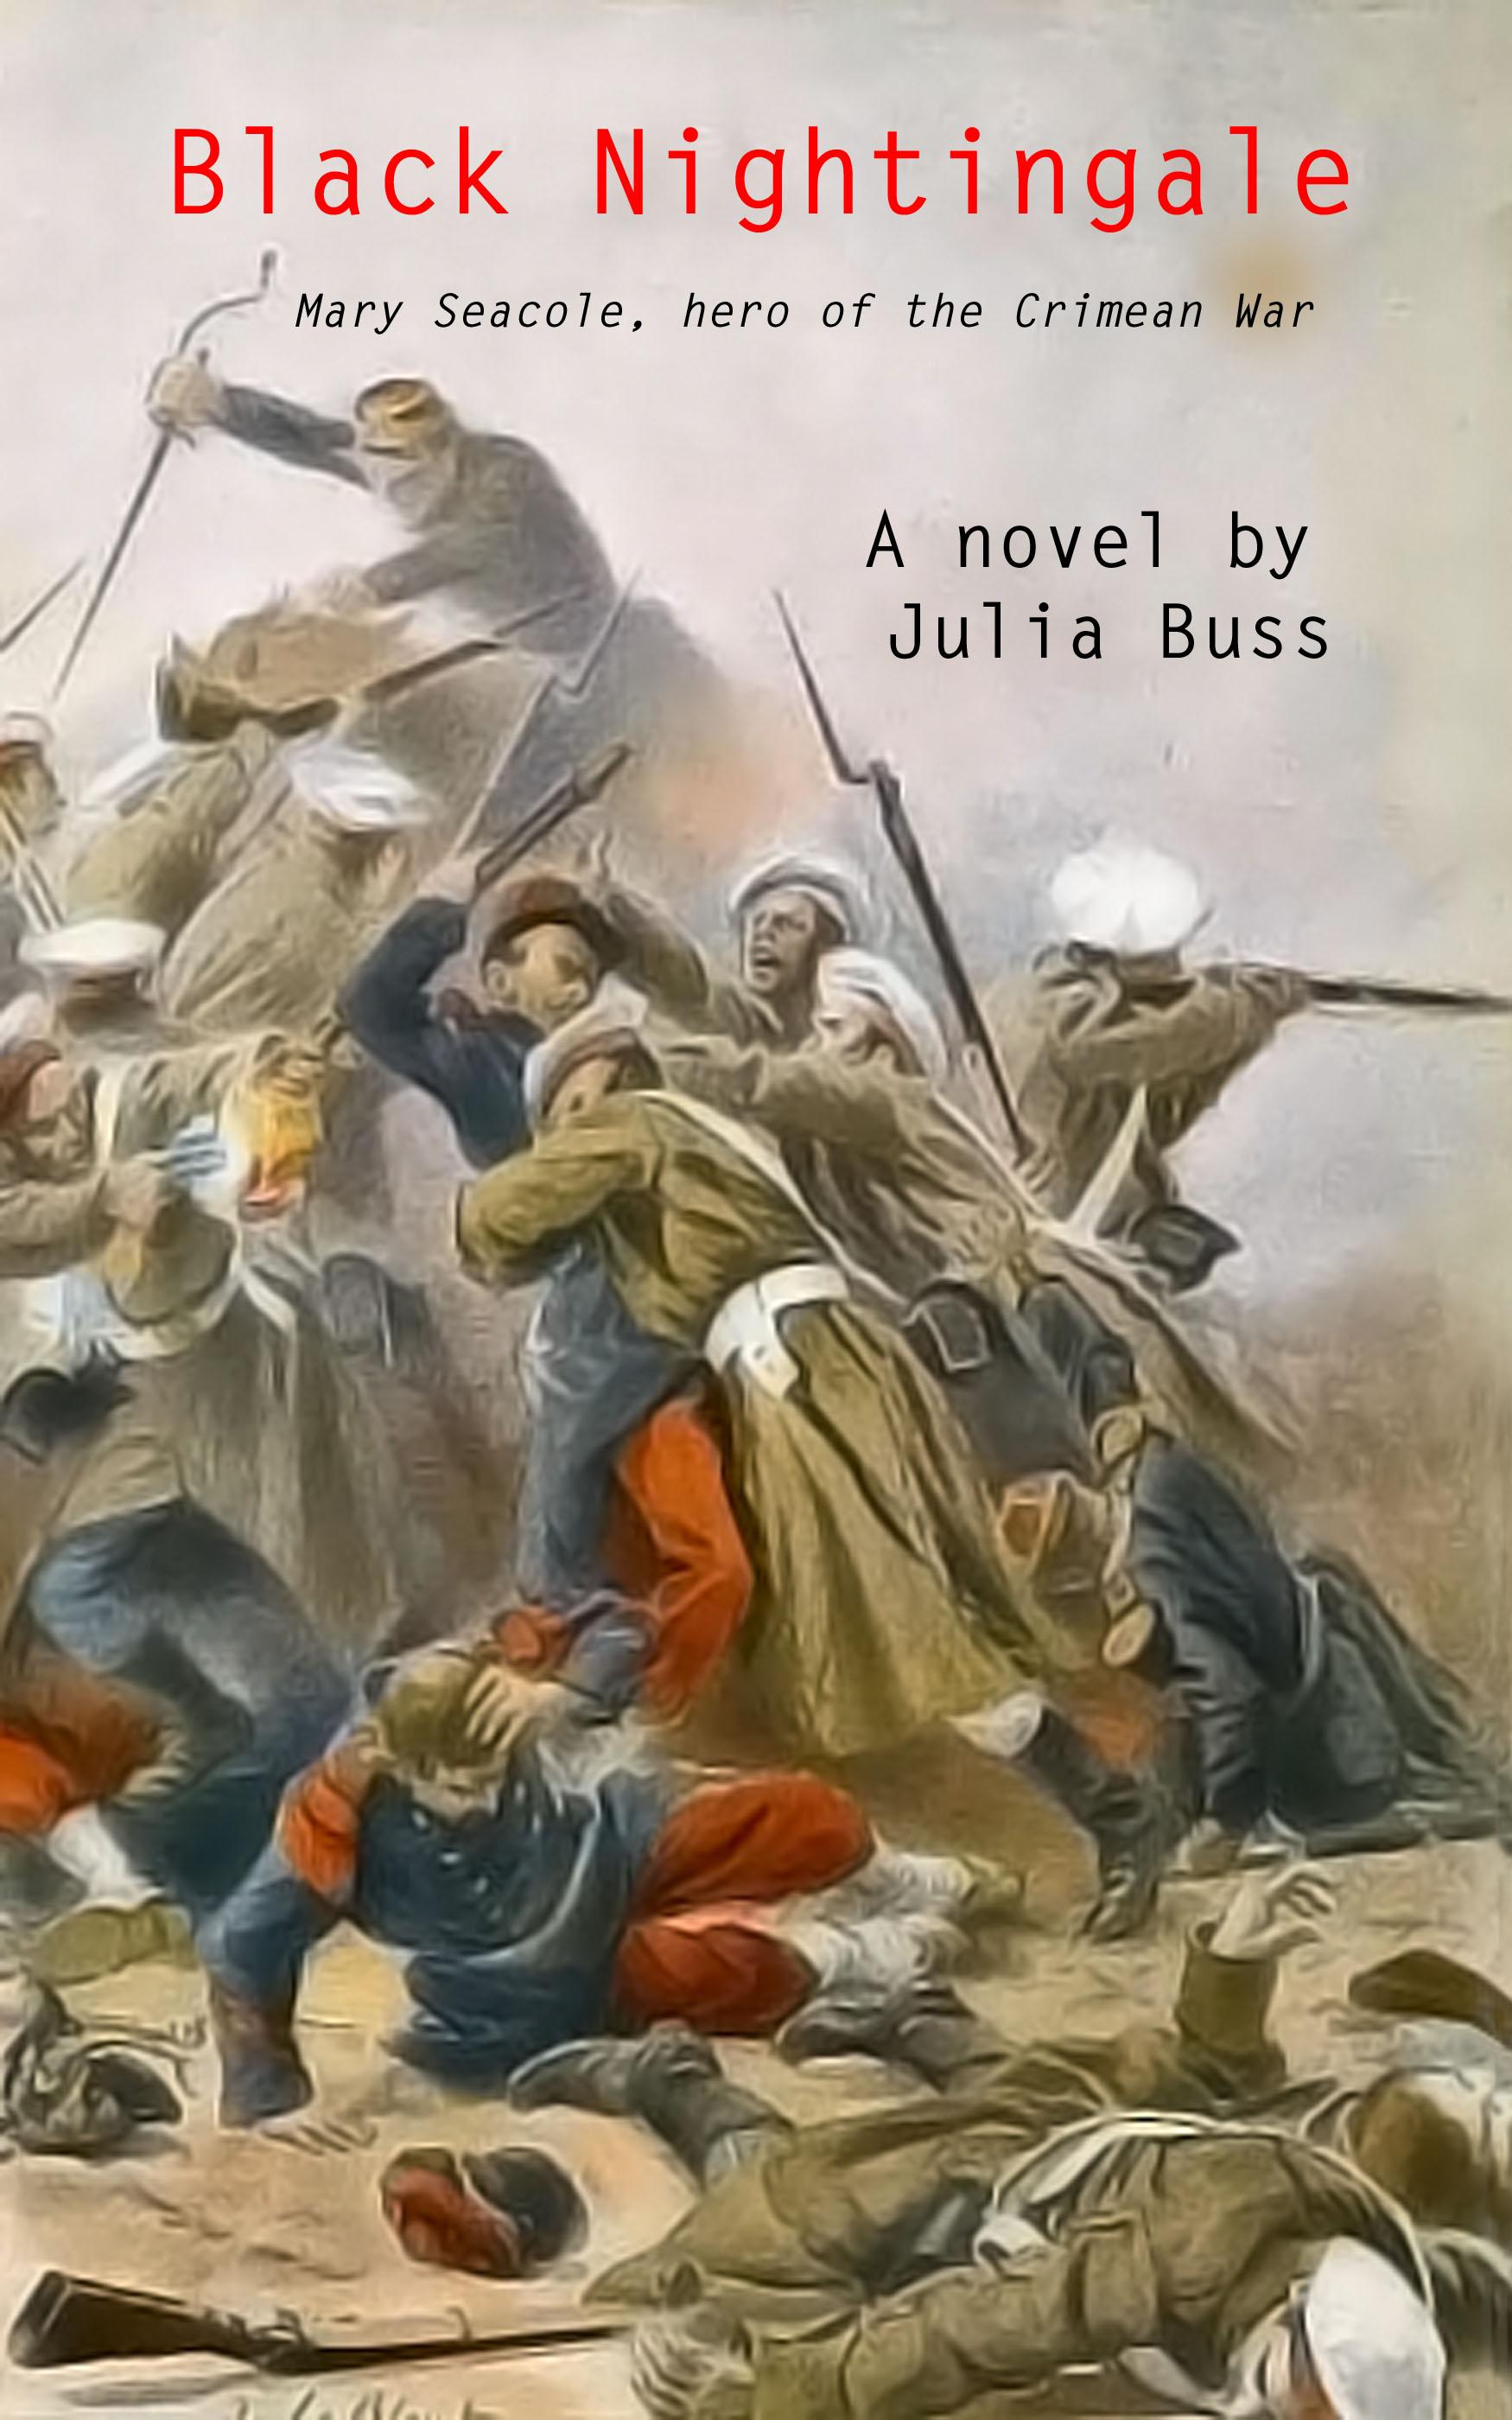 Black Nightingale: Mary Seacole, hero of the Crimean War